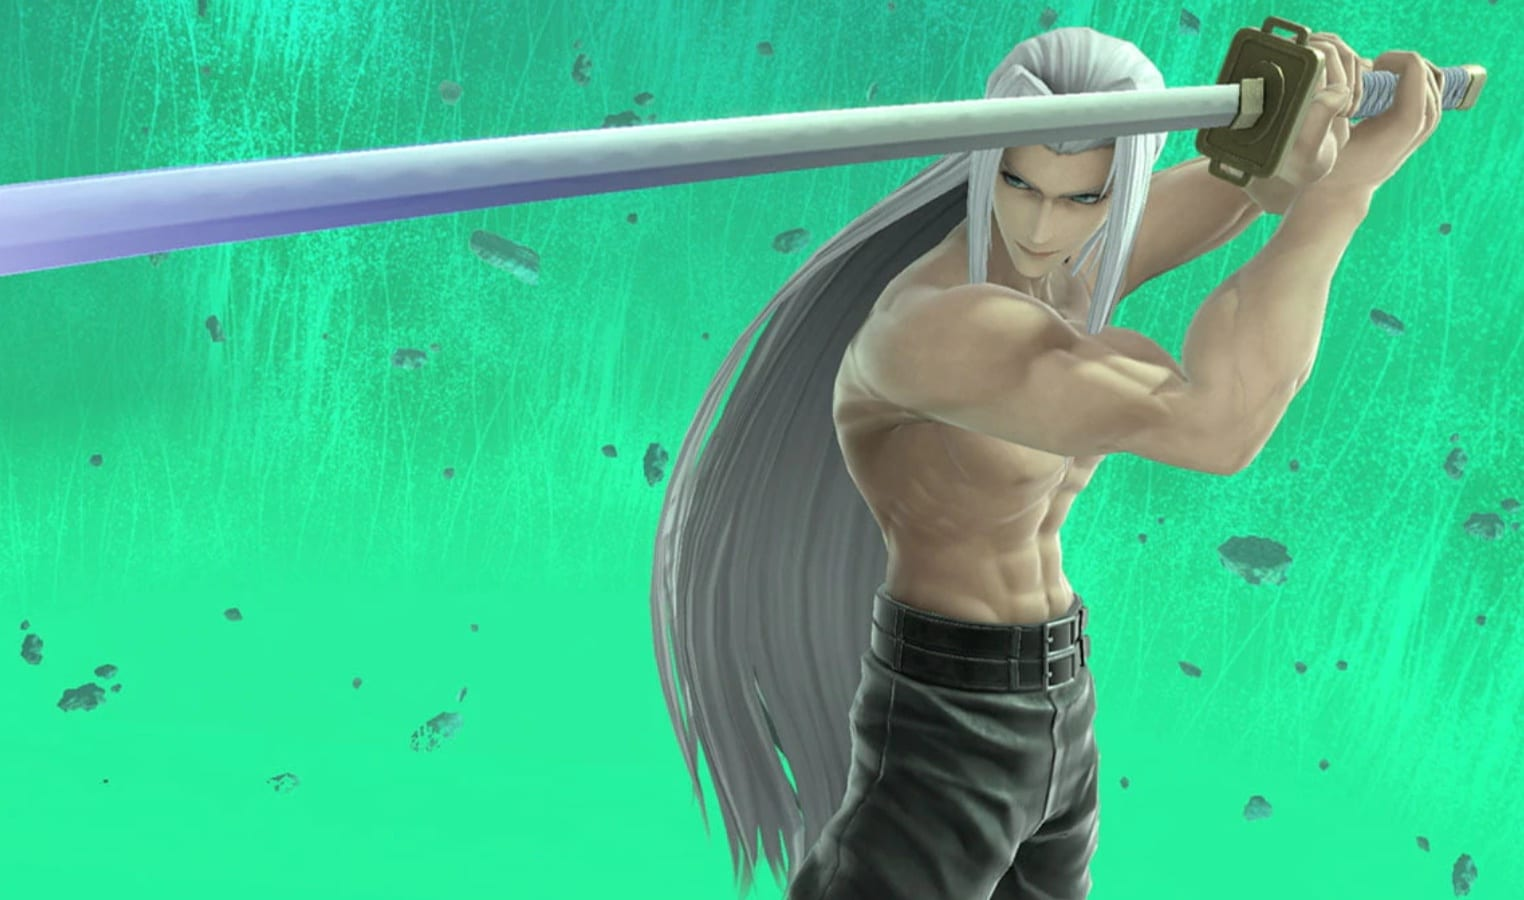 shirtless sephiroth super smash bros ultimate